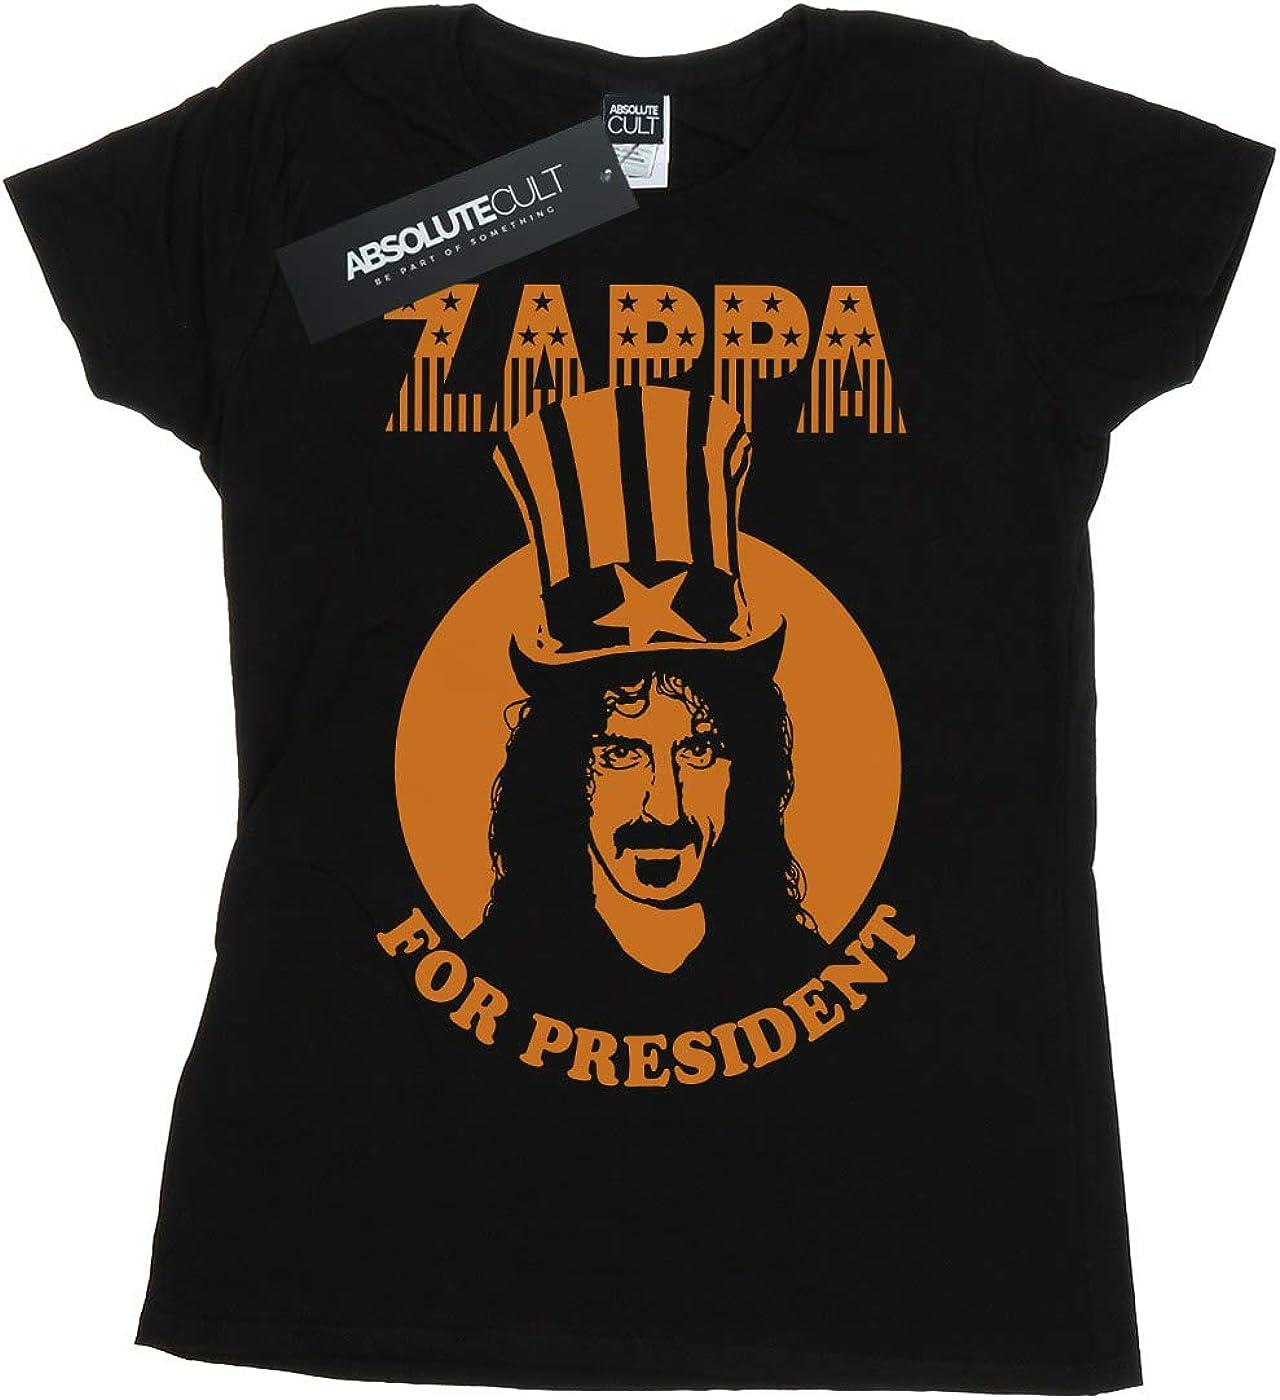 ABSOLUTECULT Frank Zappa Girls for President Sweatshirt